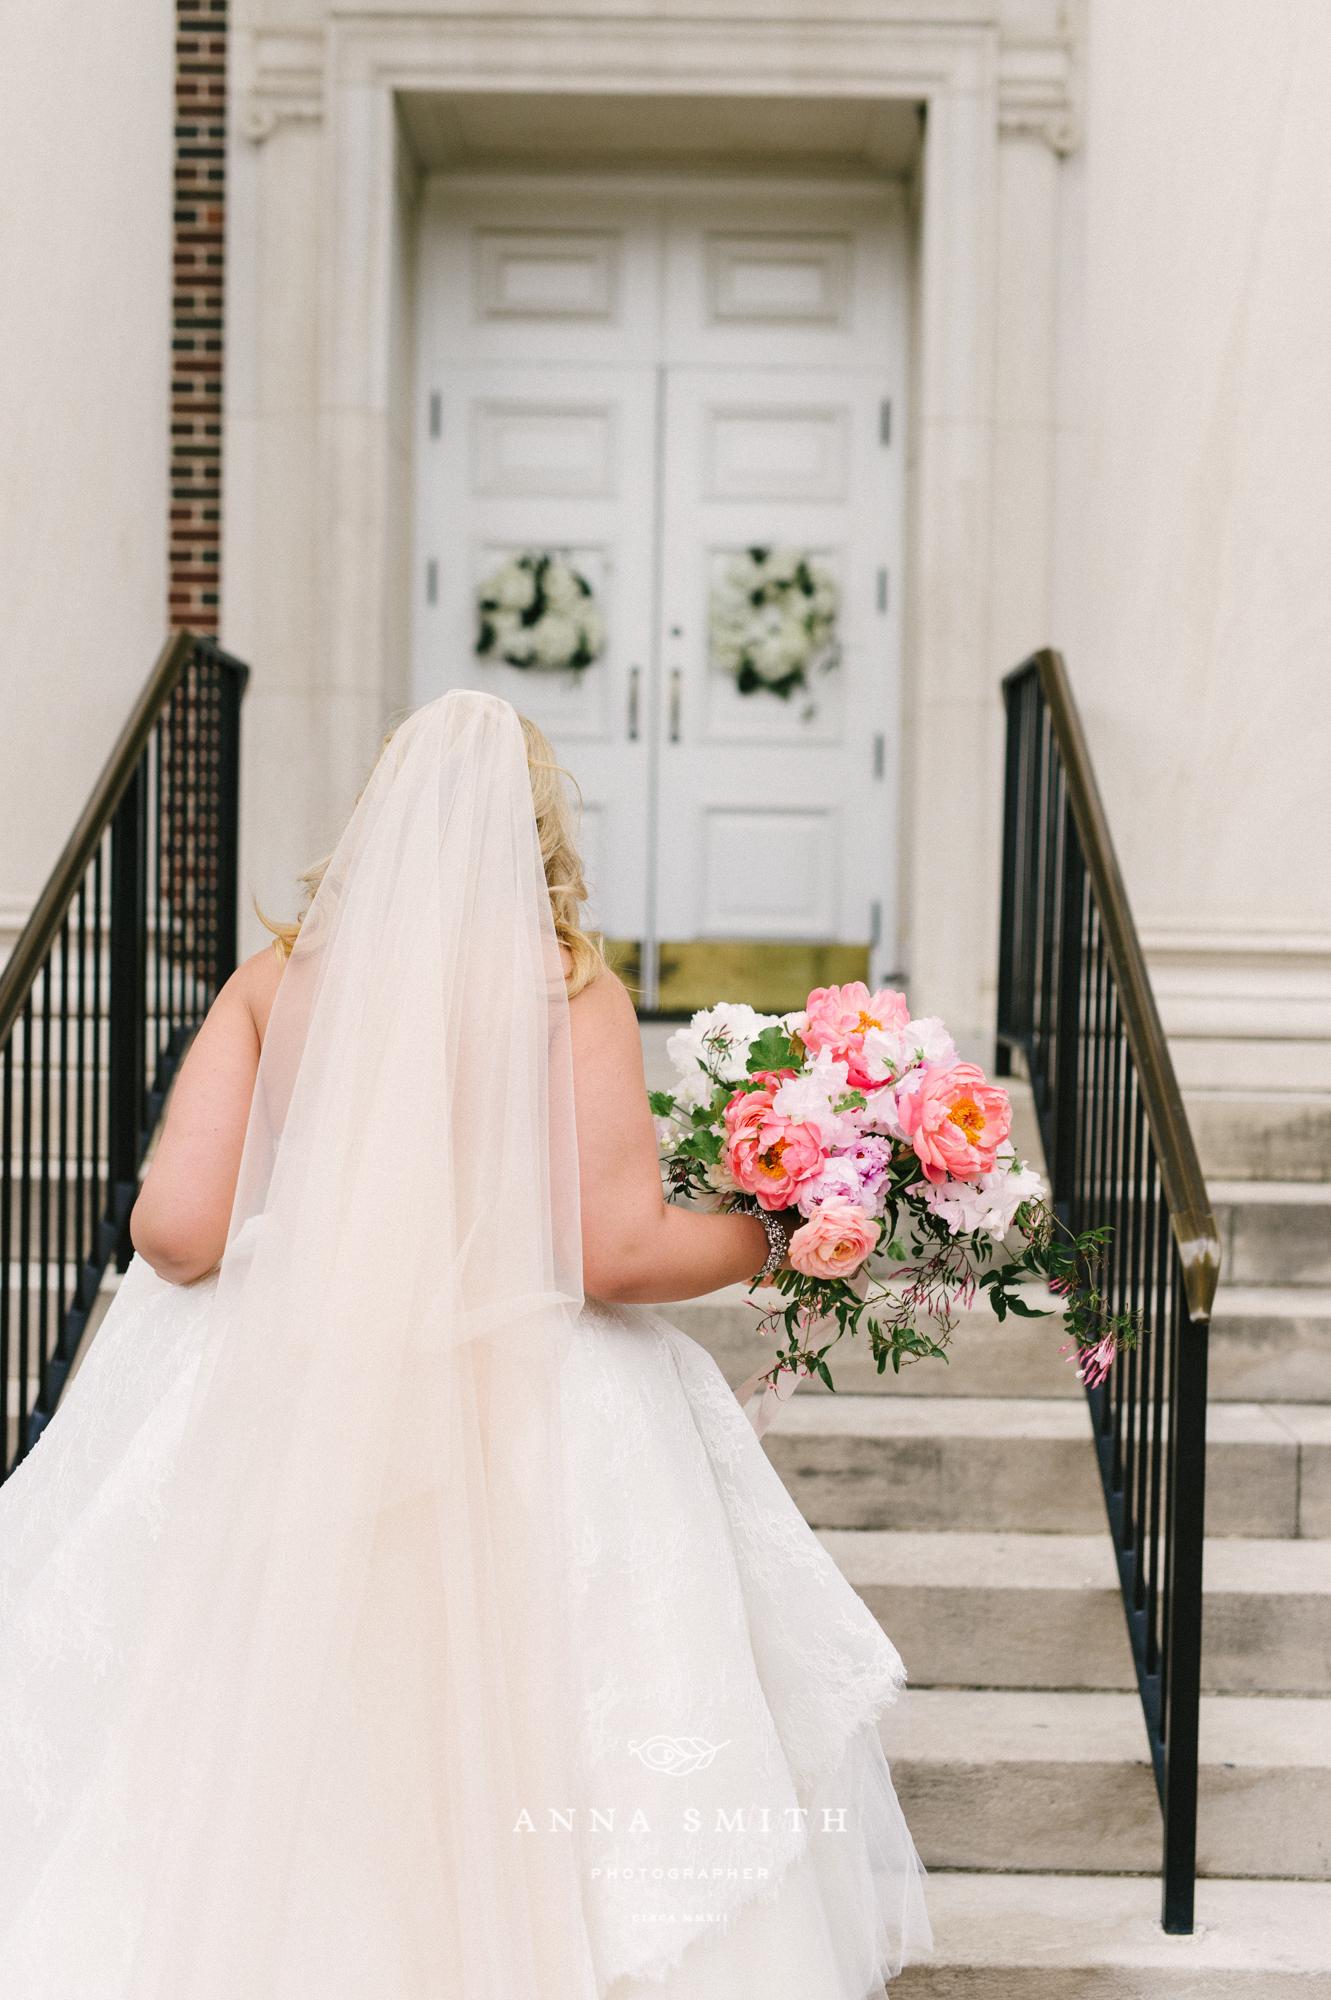 web 17- 4-W-CD-heather brandon wedding perkins adolphus-375.jpg